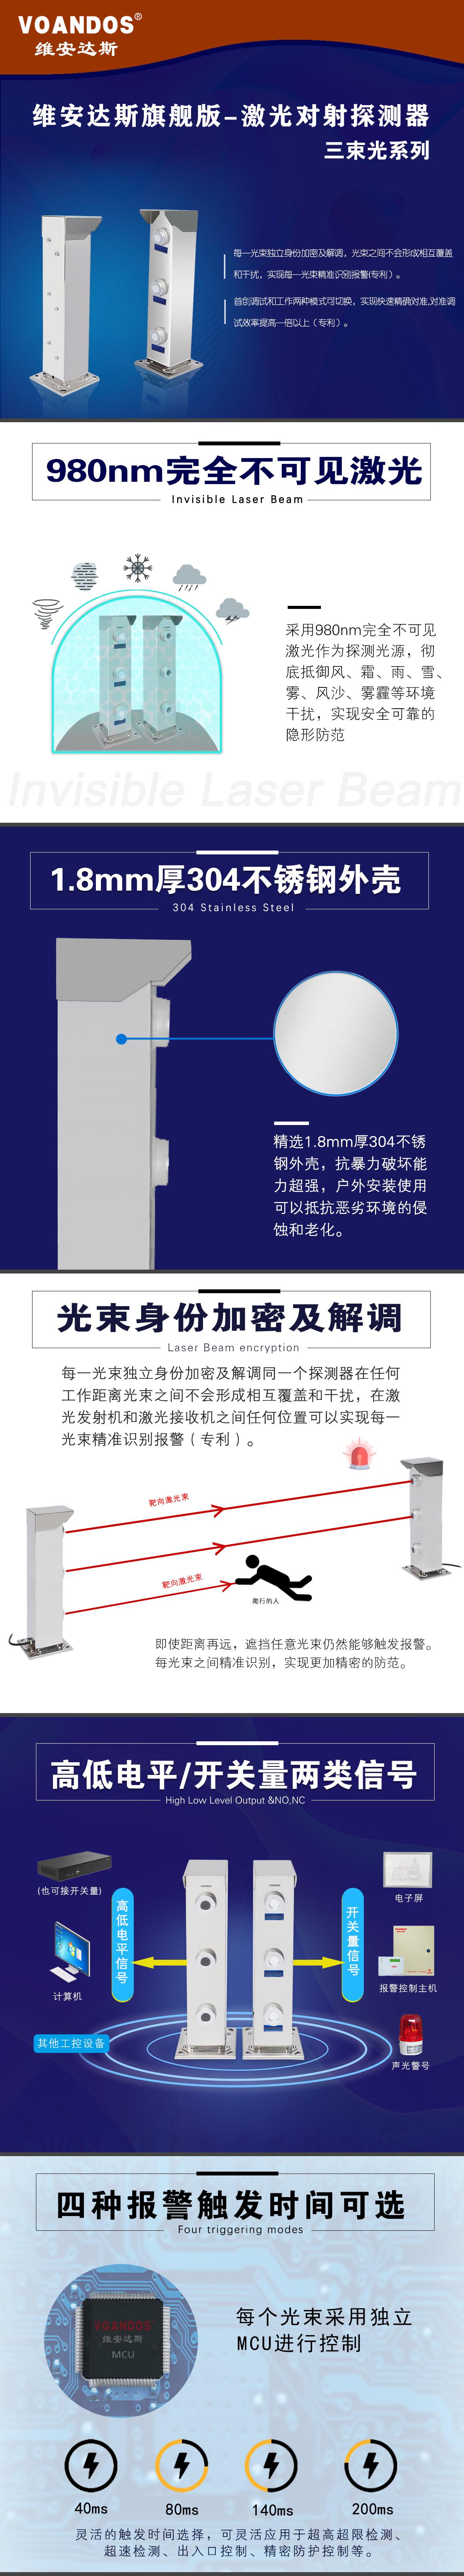 500xxxcom_广州市艾礼富电子-激光对射探测器(旗舰版) abj-xxx-3j